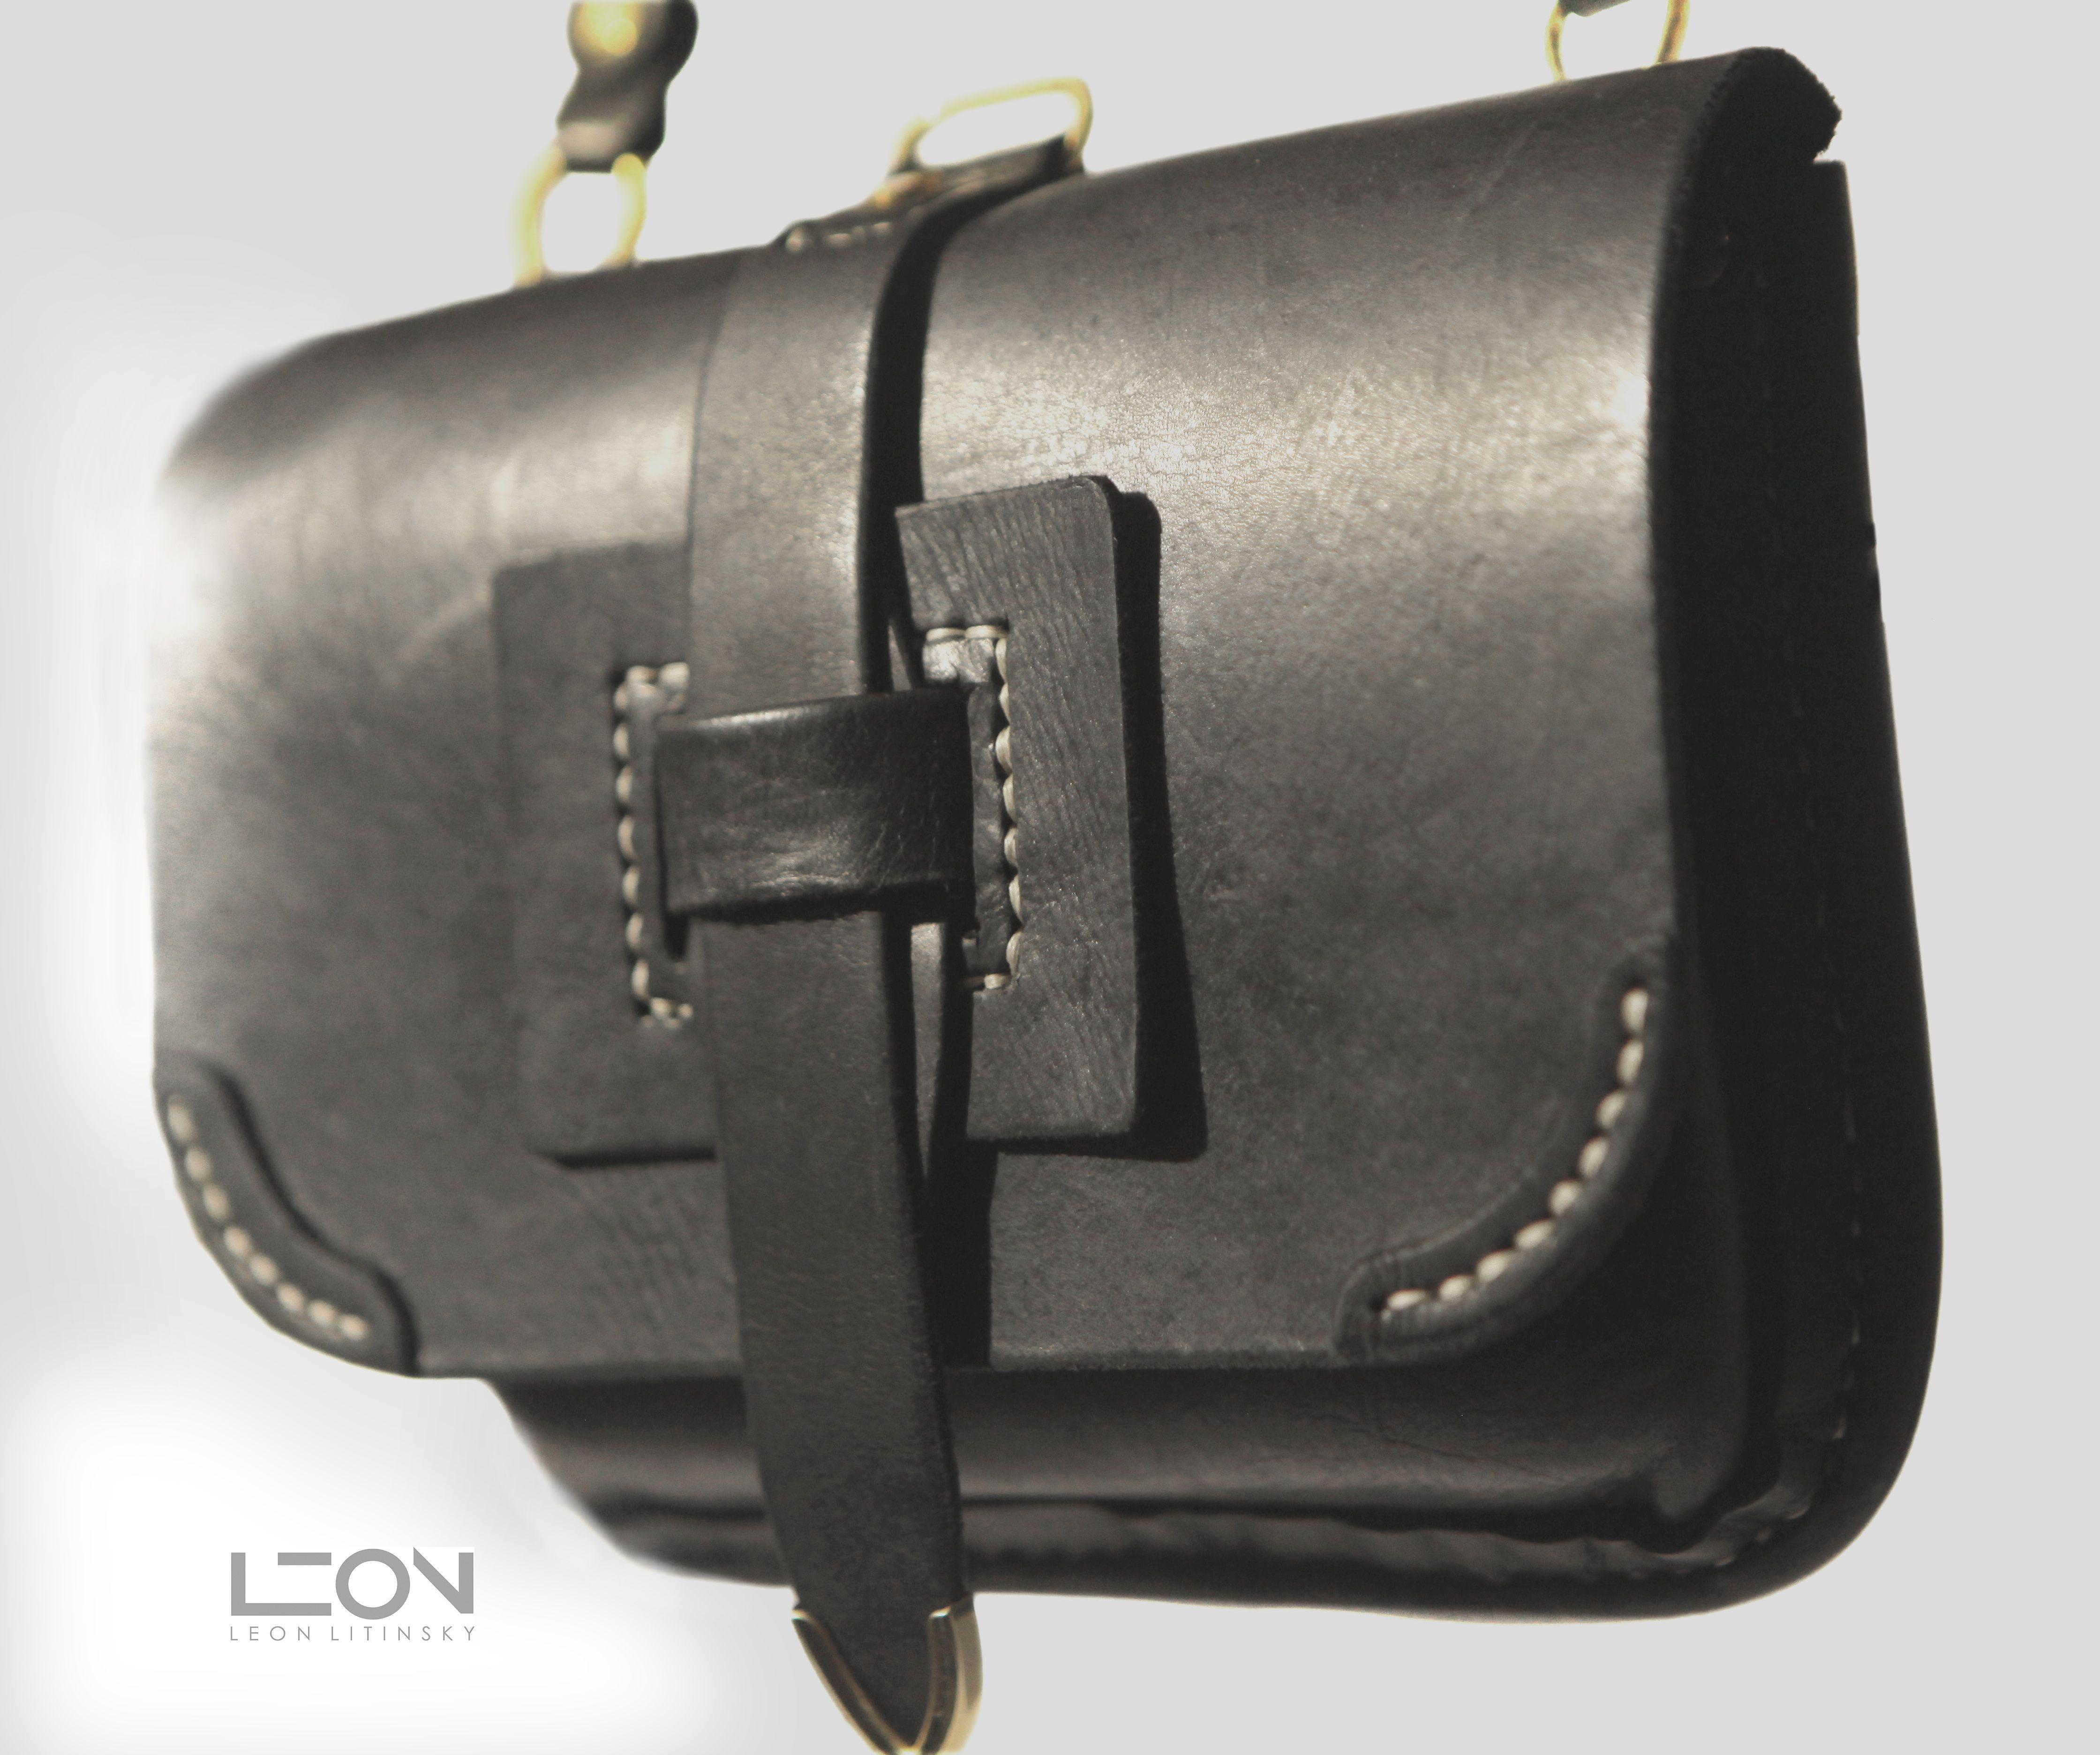 Black Leather Purse by Leon Litinsky